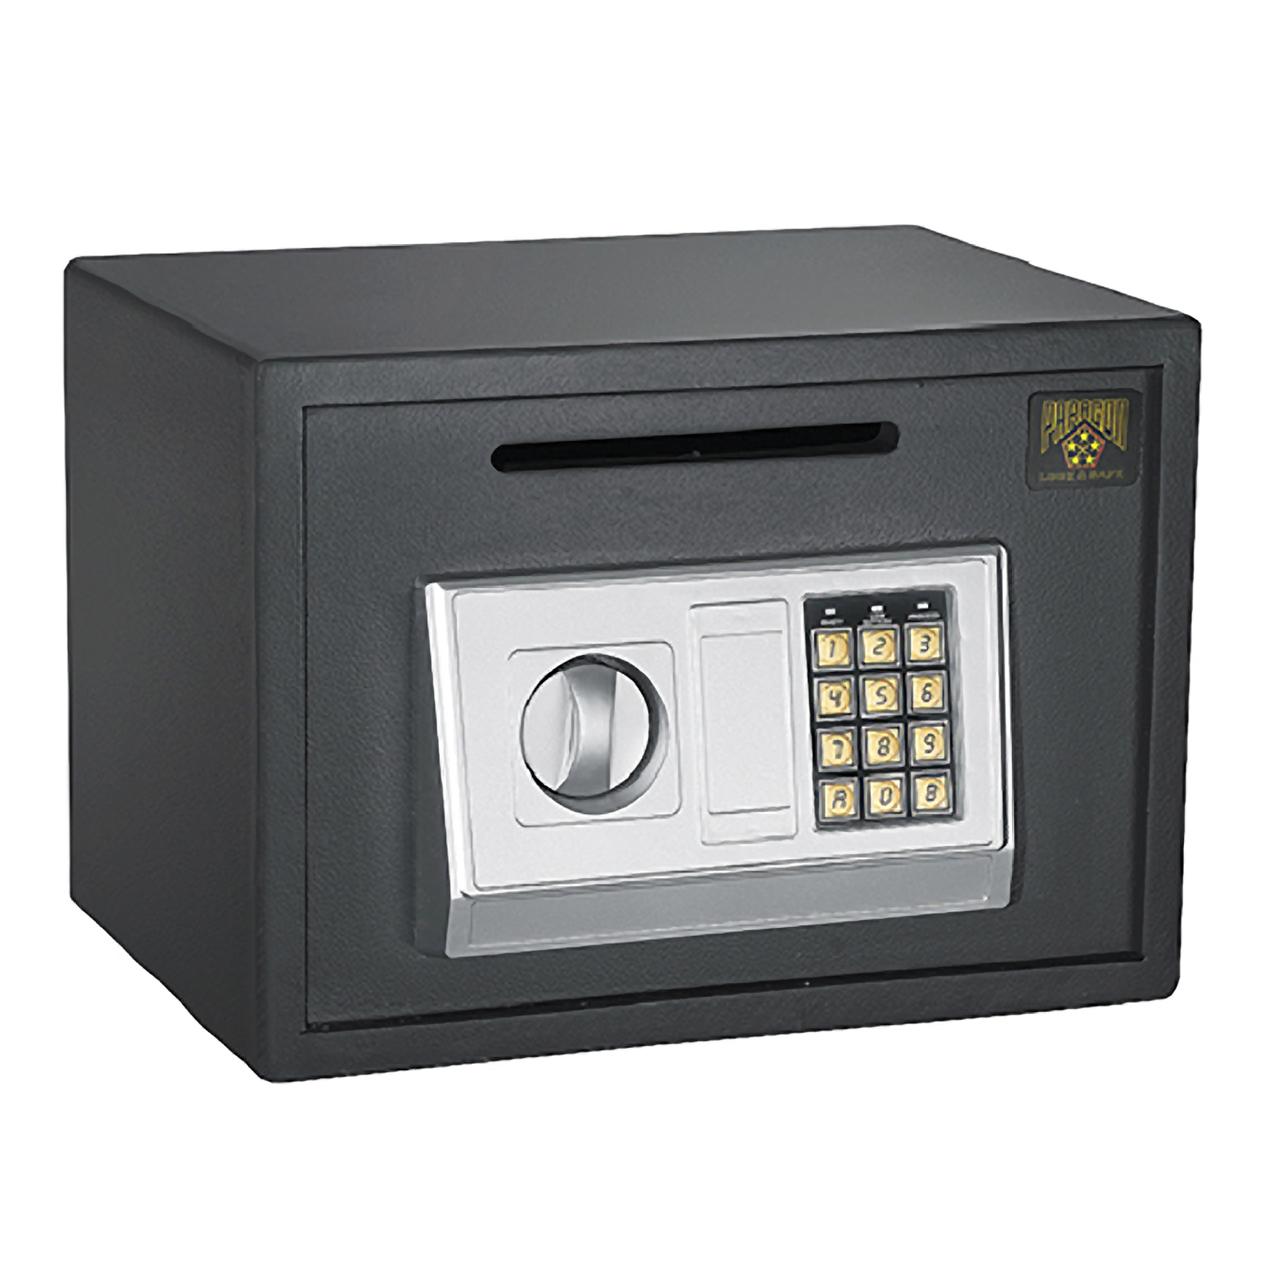 Paragon Lock Safe Digital Depository Safe Cash Drop